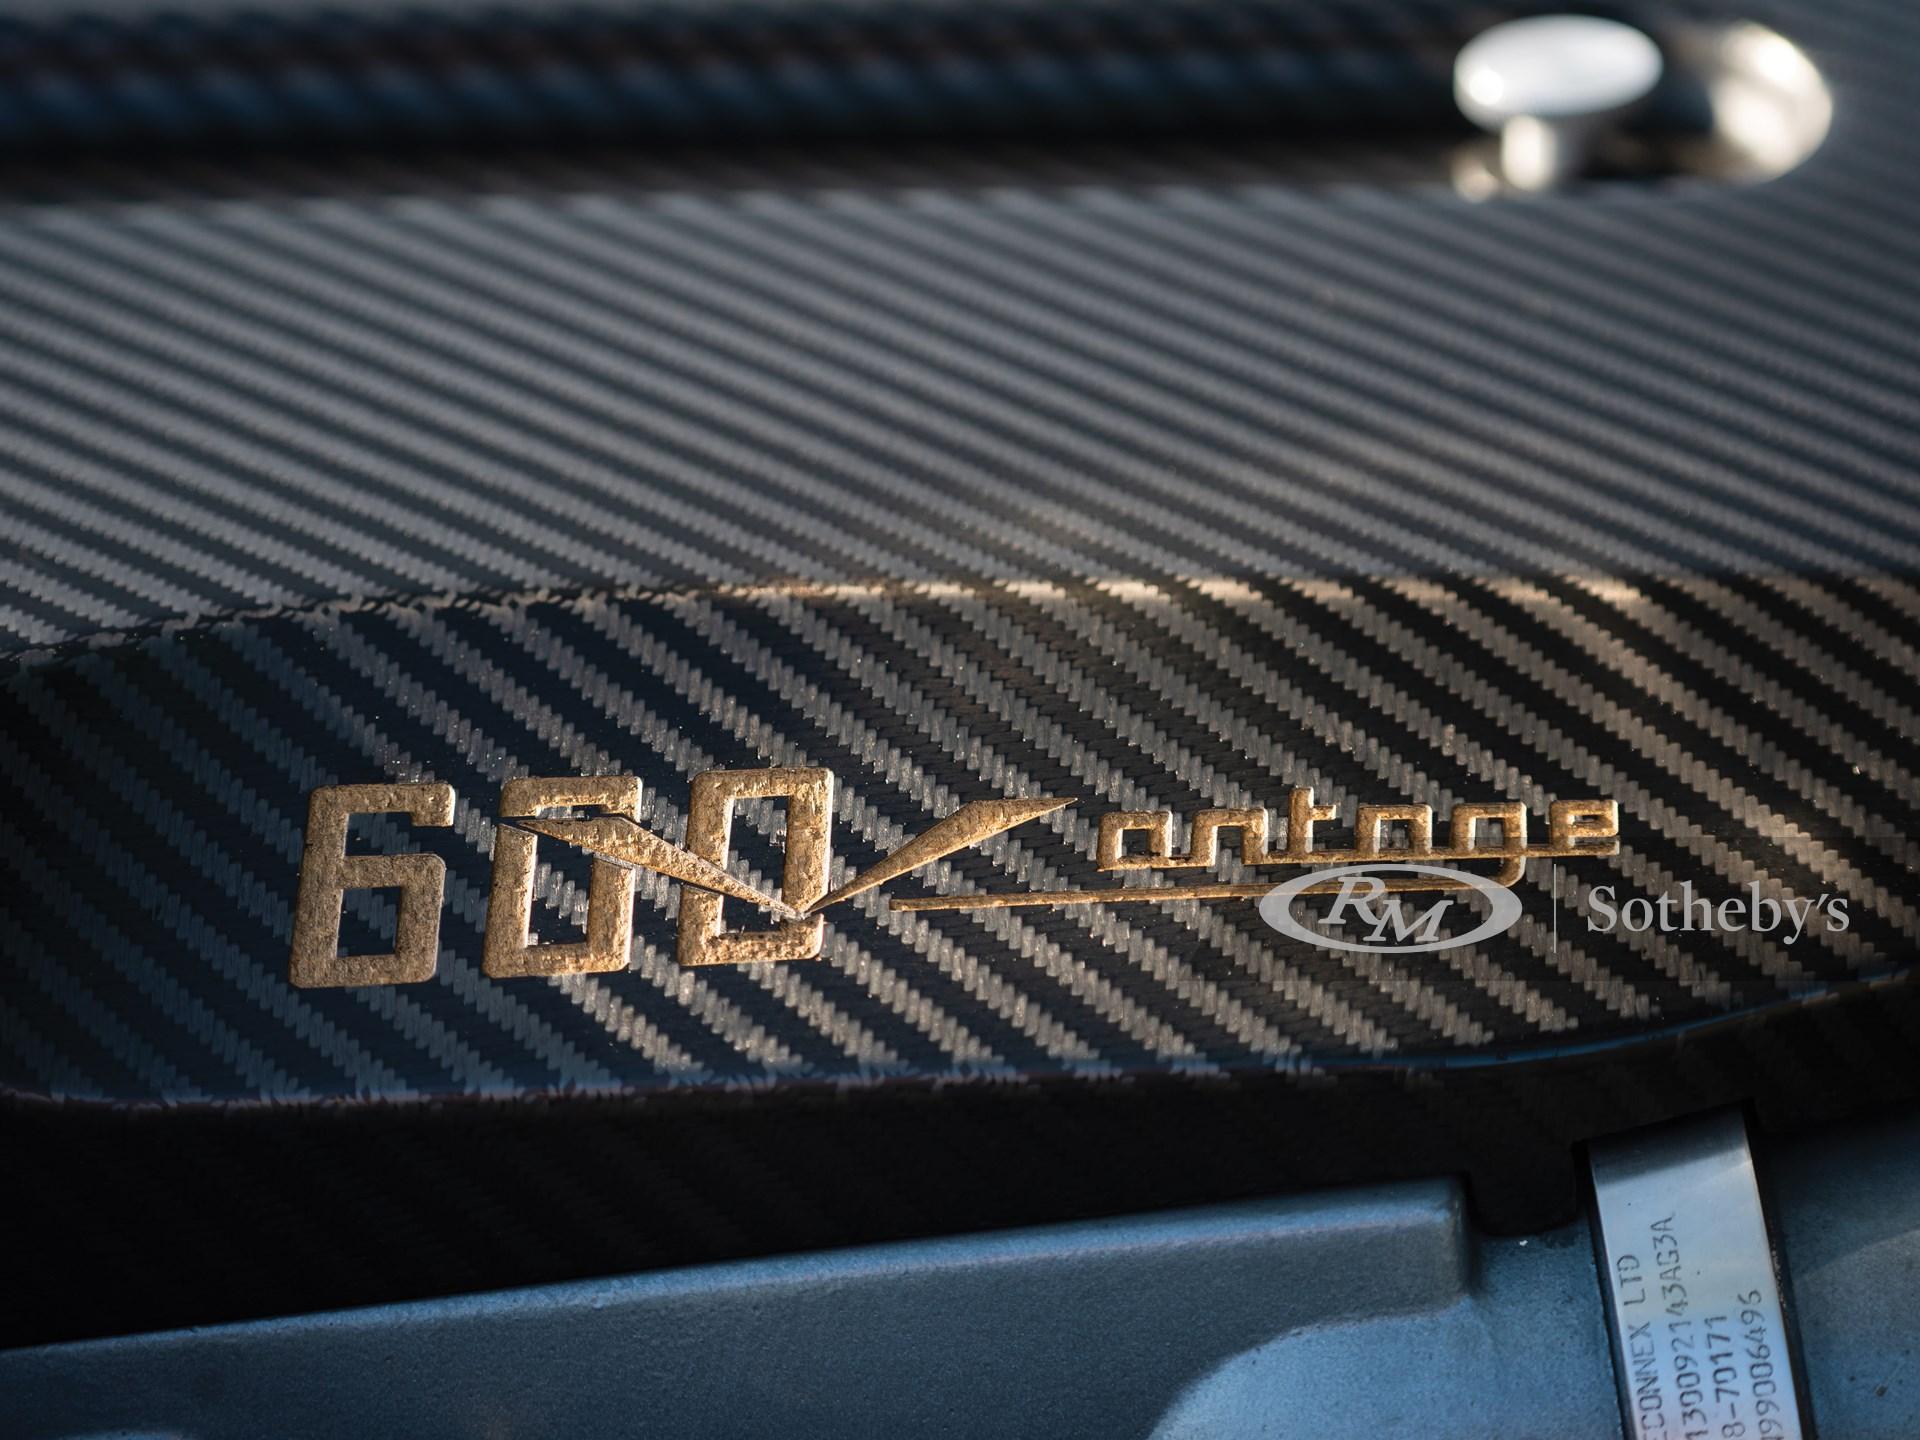 2000 Aston Martin Vantage Le Mans V600  -